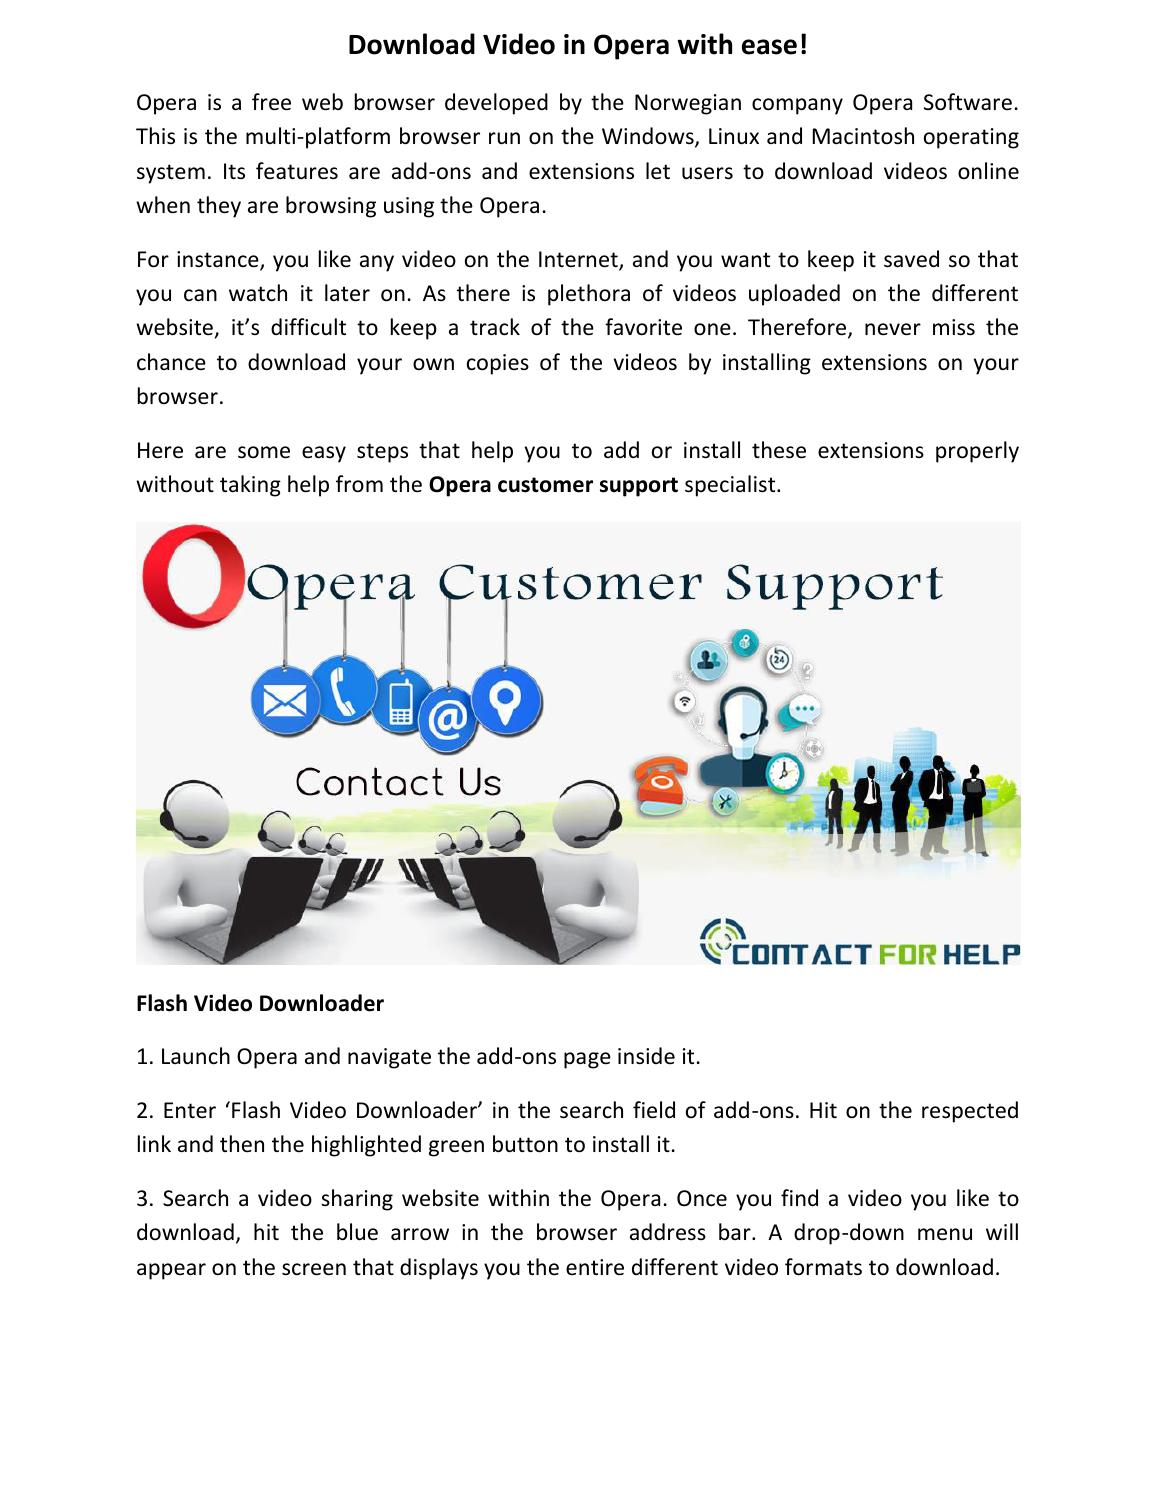 opera link download